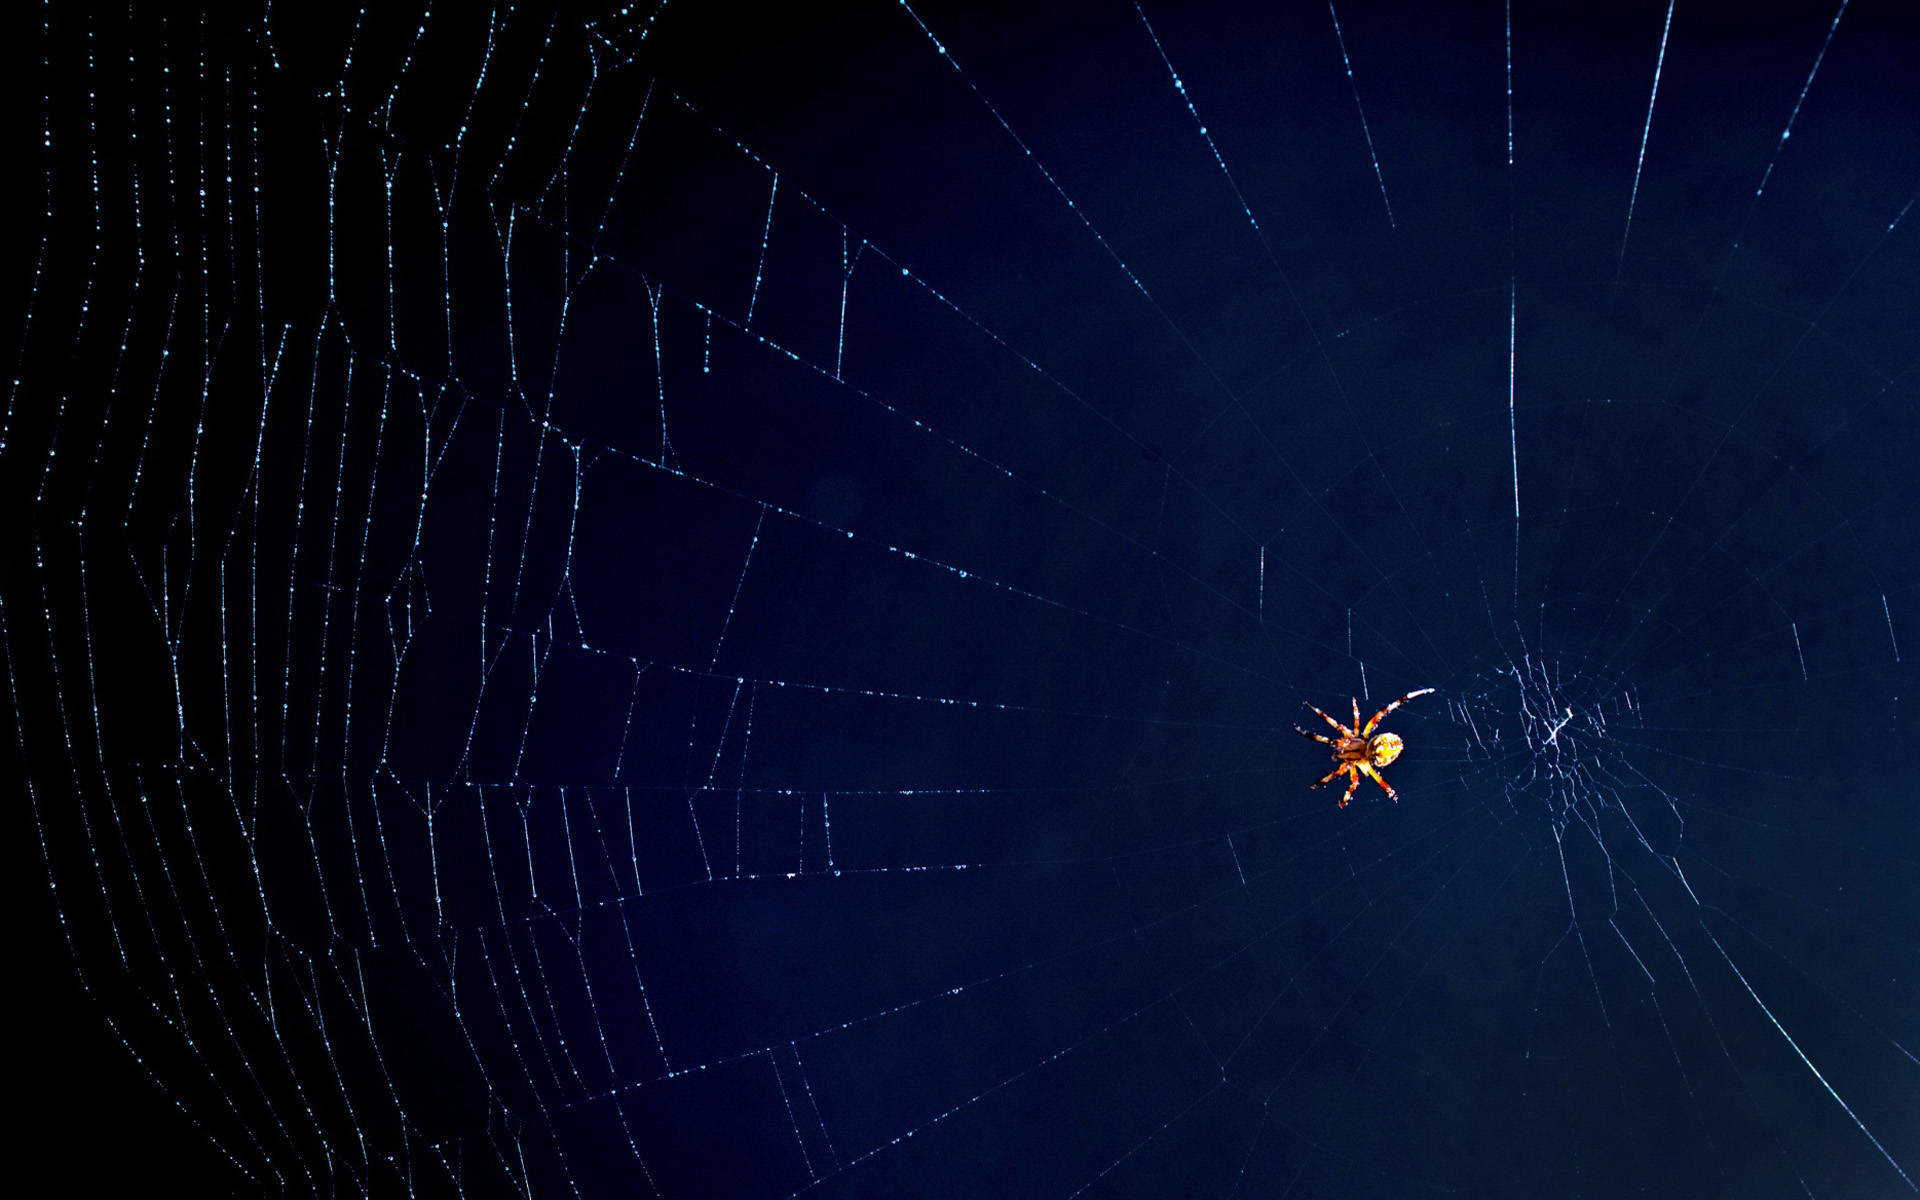 Top Spider Web Fractal Wallpaper 1920×1080 Wallpapers